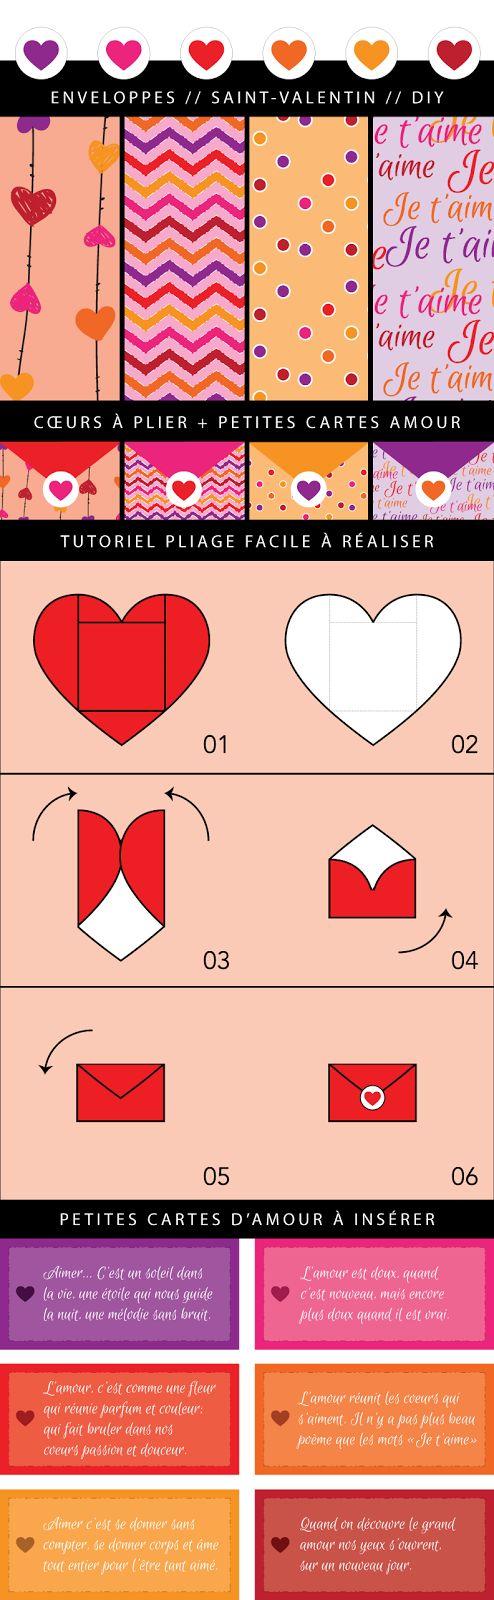 Nadi[Art]Design: Coeurs à plier / Saint-Valentin / DIY